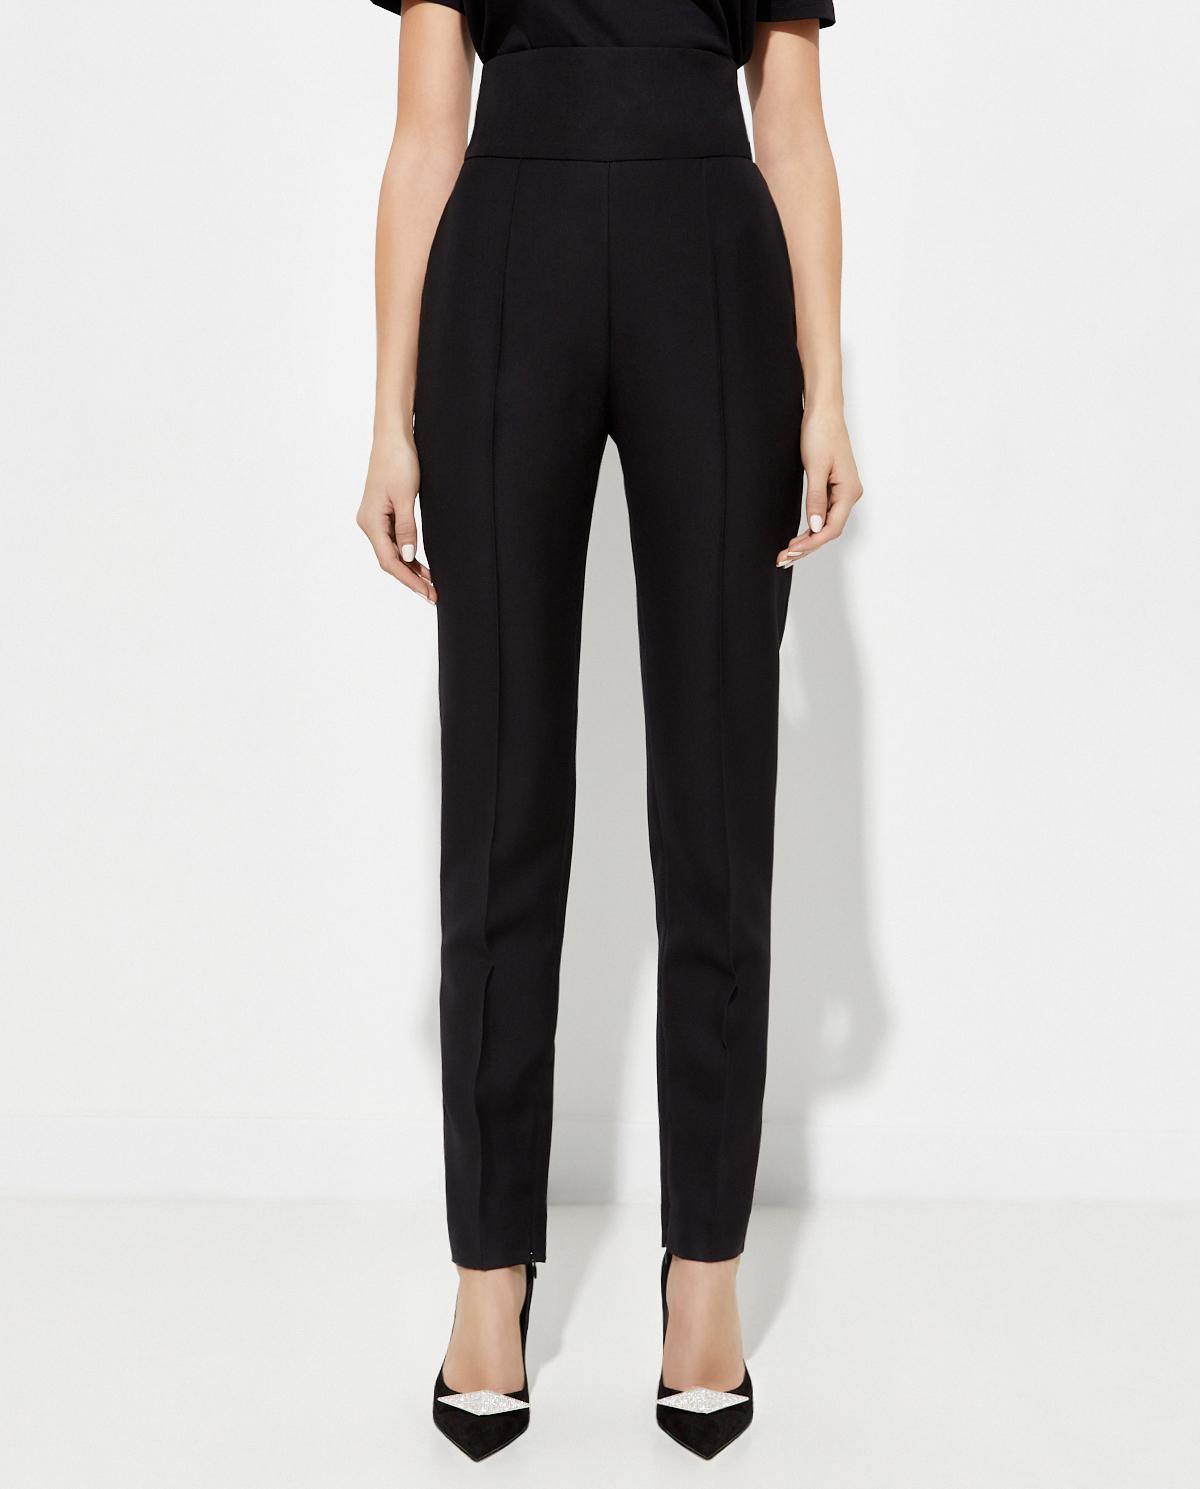 Czarne spodnie z wysokim stanem Alexandre Vauthier 204PA900 0193-1106 BLACK